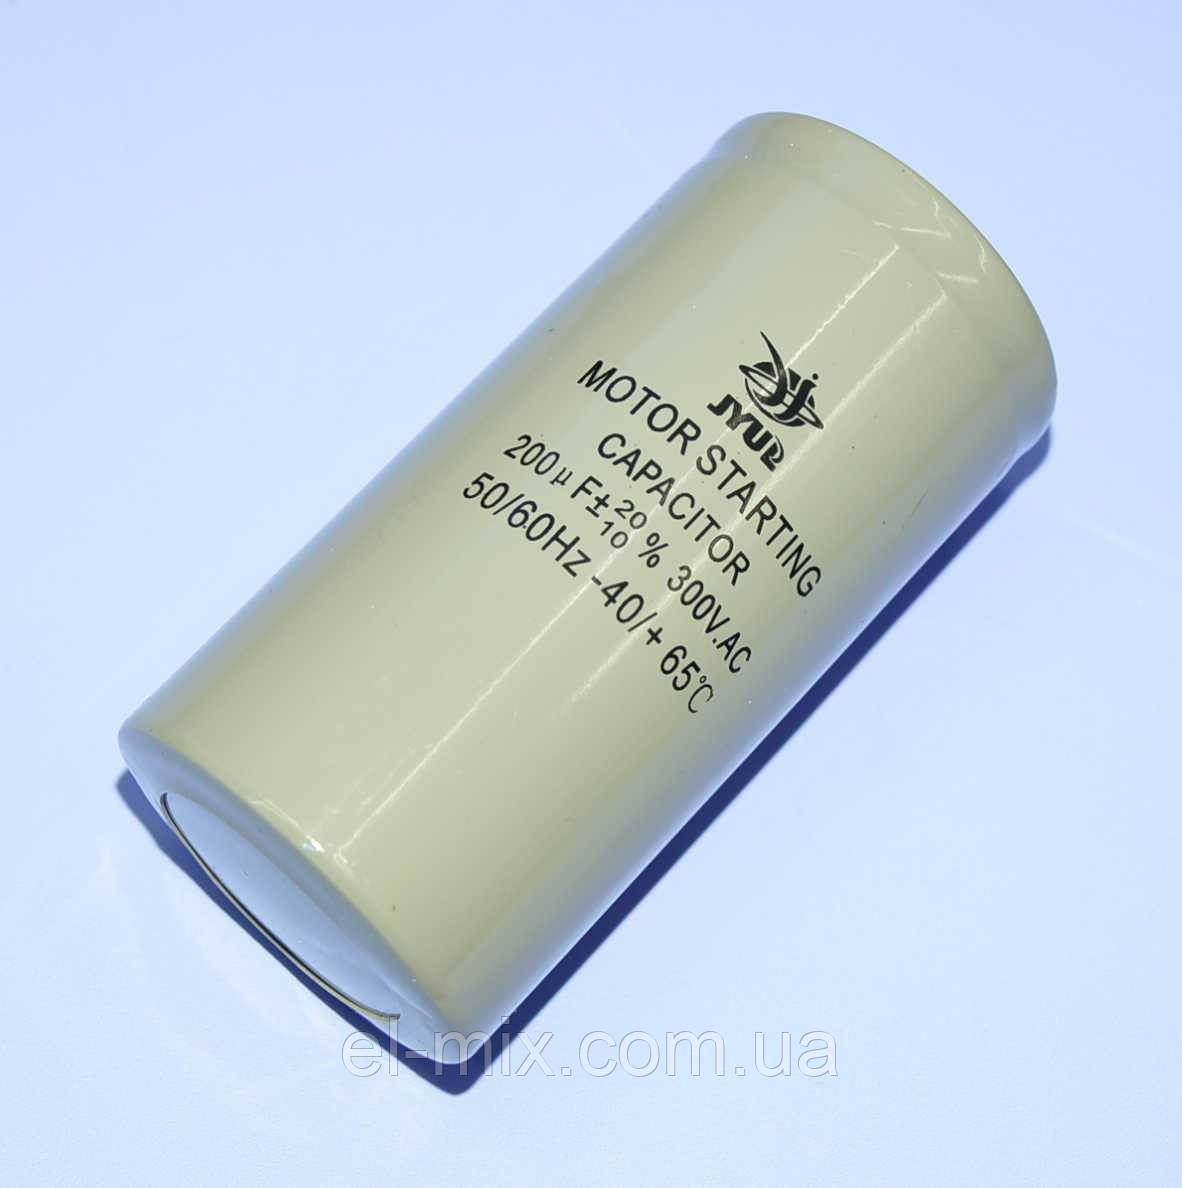 Конденсатор CD-60  200µF 300VAC 50*100мм  JYUL